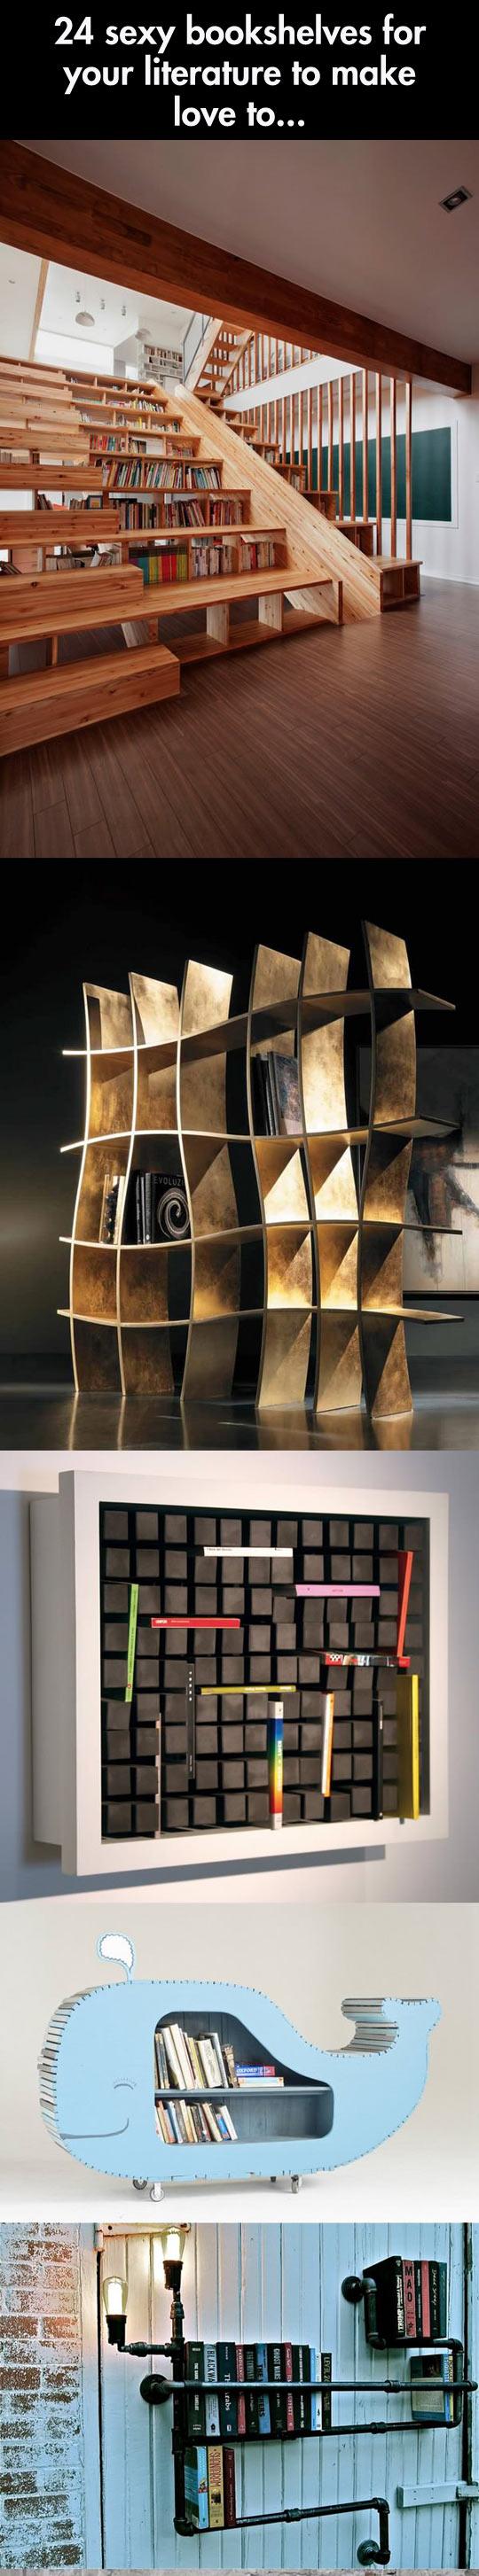 funny-books-shelf-stairs-wood-furniture